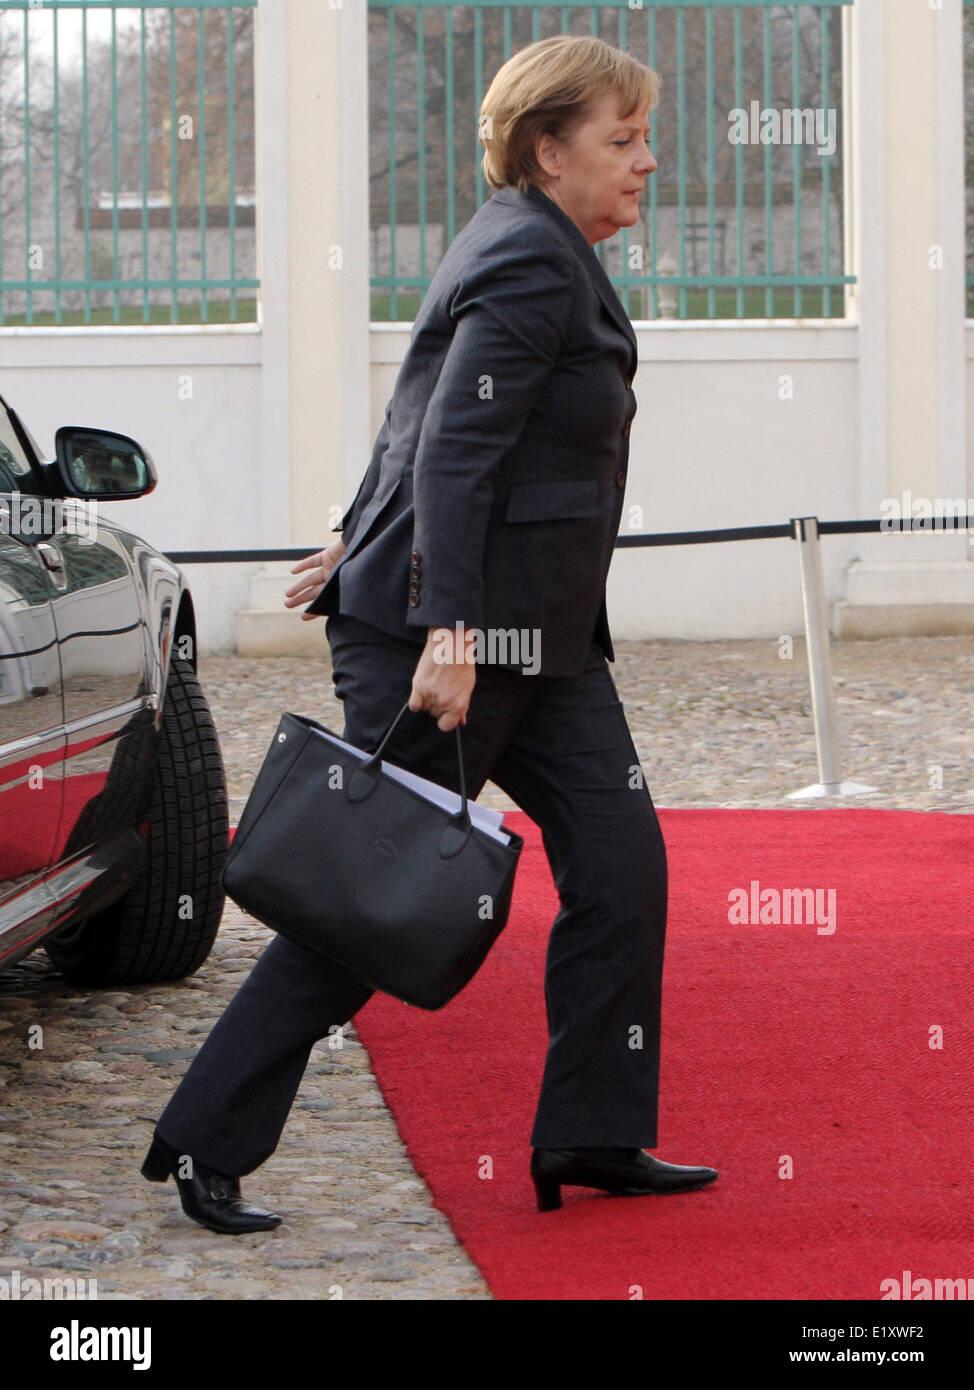 Chancellor Angela Merkel arrives in a hurry in Meseberg for German-Italian government talks (20.11.2007). Foto: - Stock Image